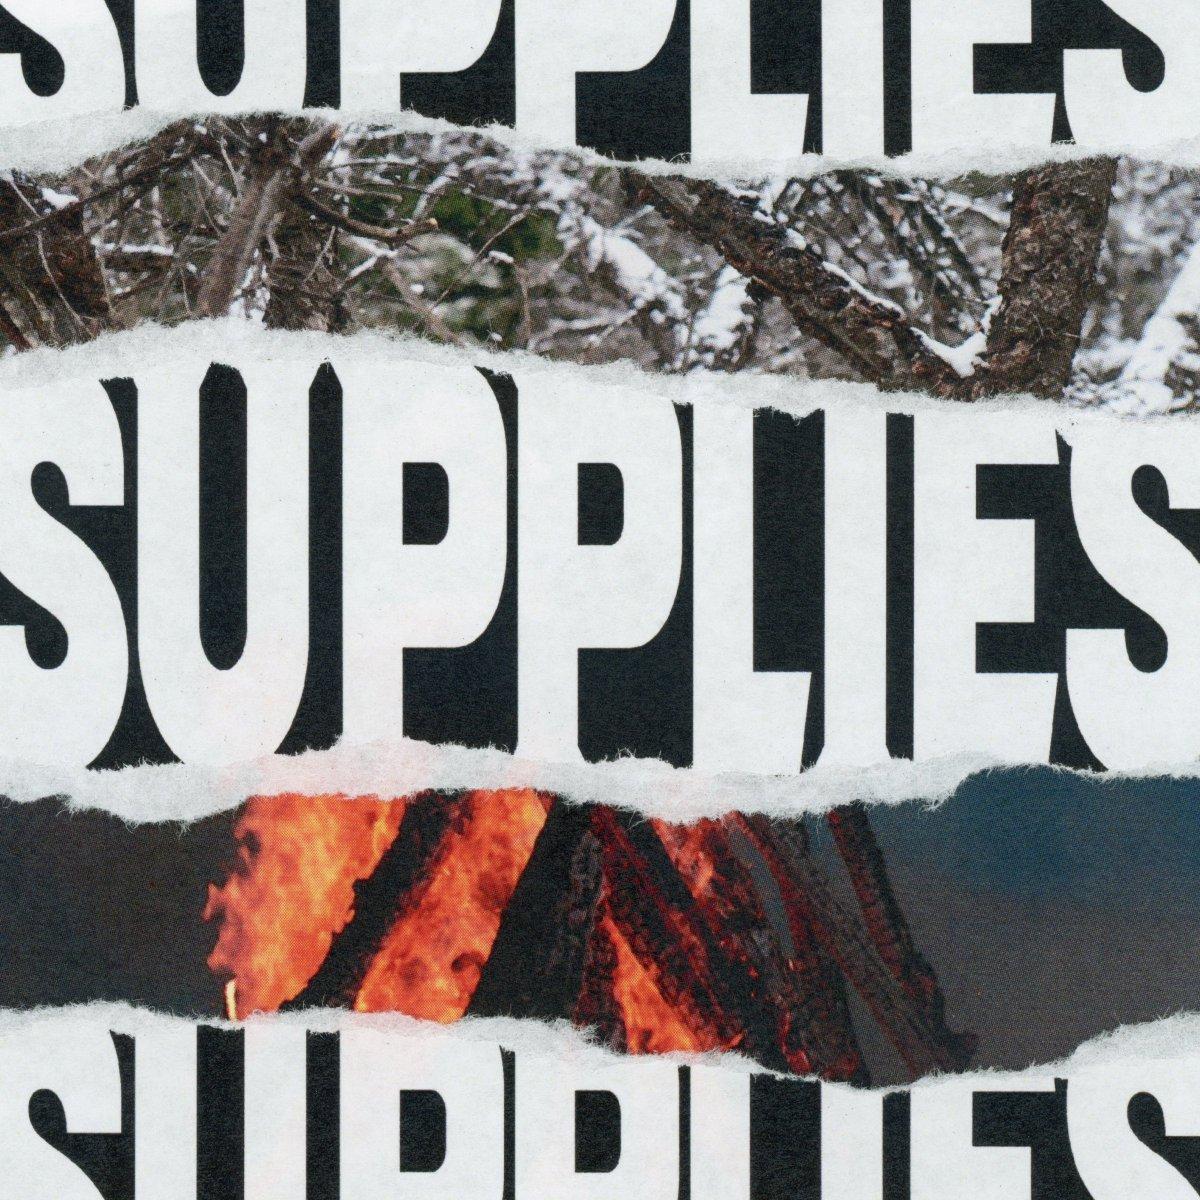 2 of 4. Supplies  https://t.co/PlAckg5LUQ